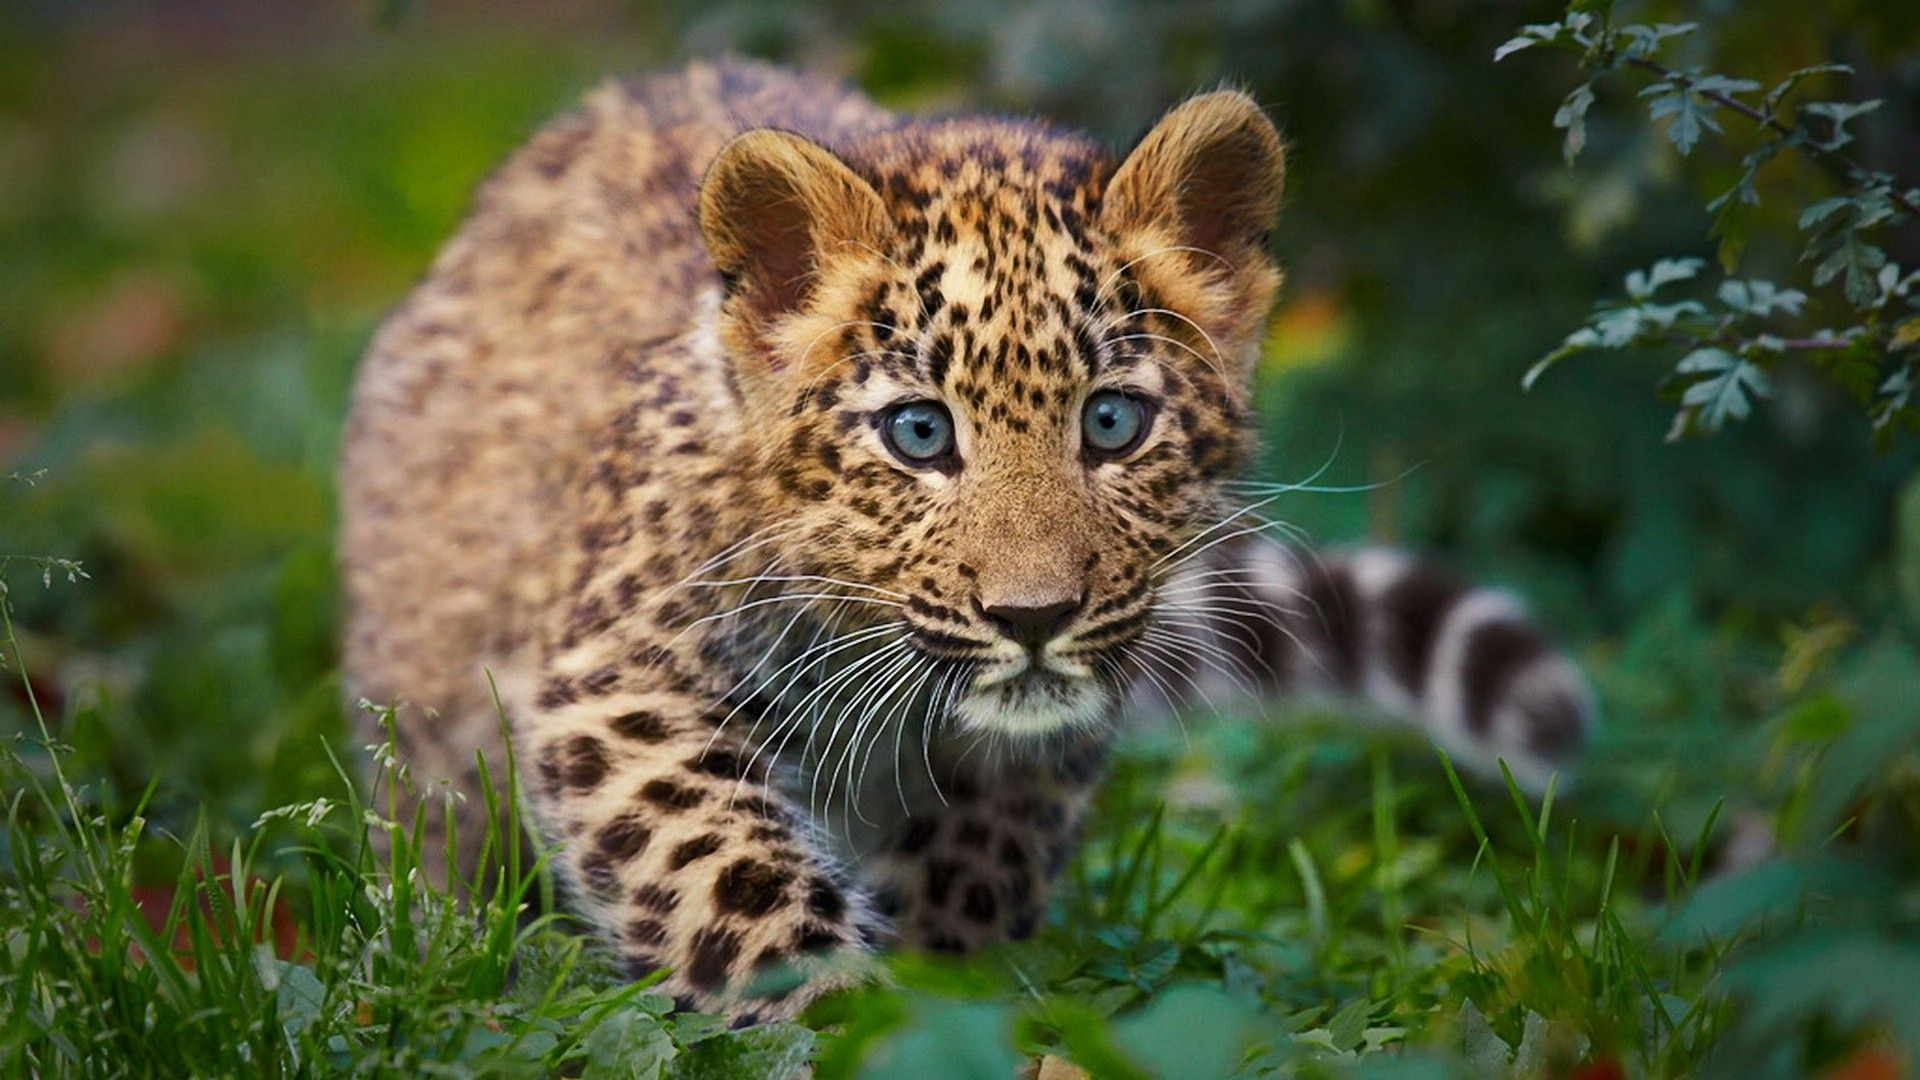 Baby Cheetah Wallpaper HD Wallpapers Pinterest Cheetah